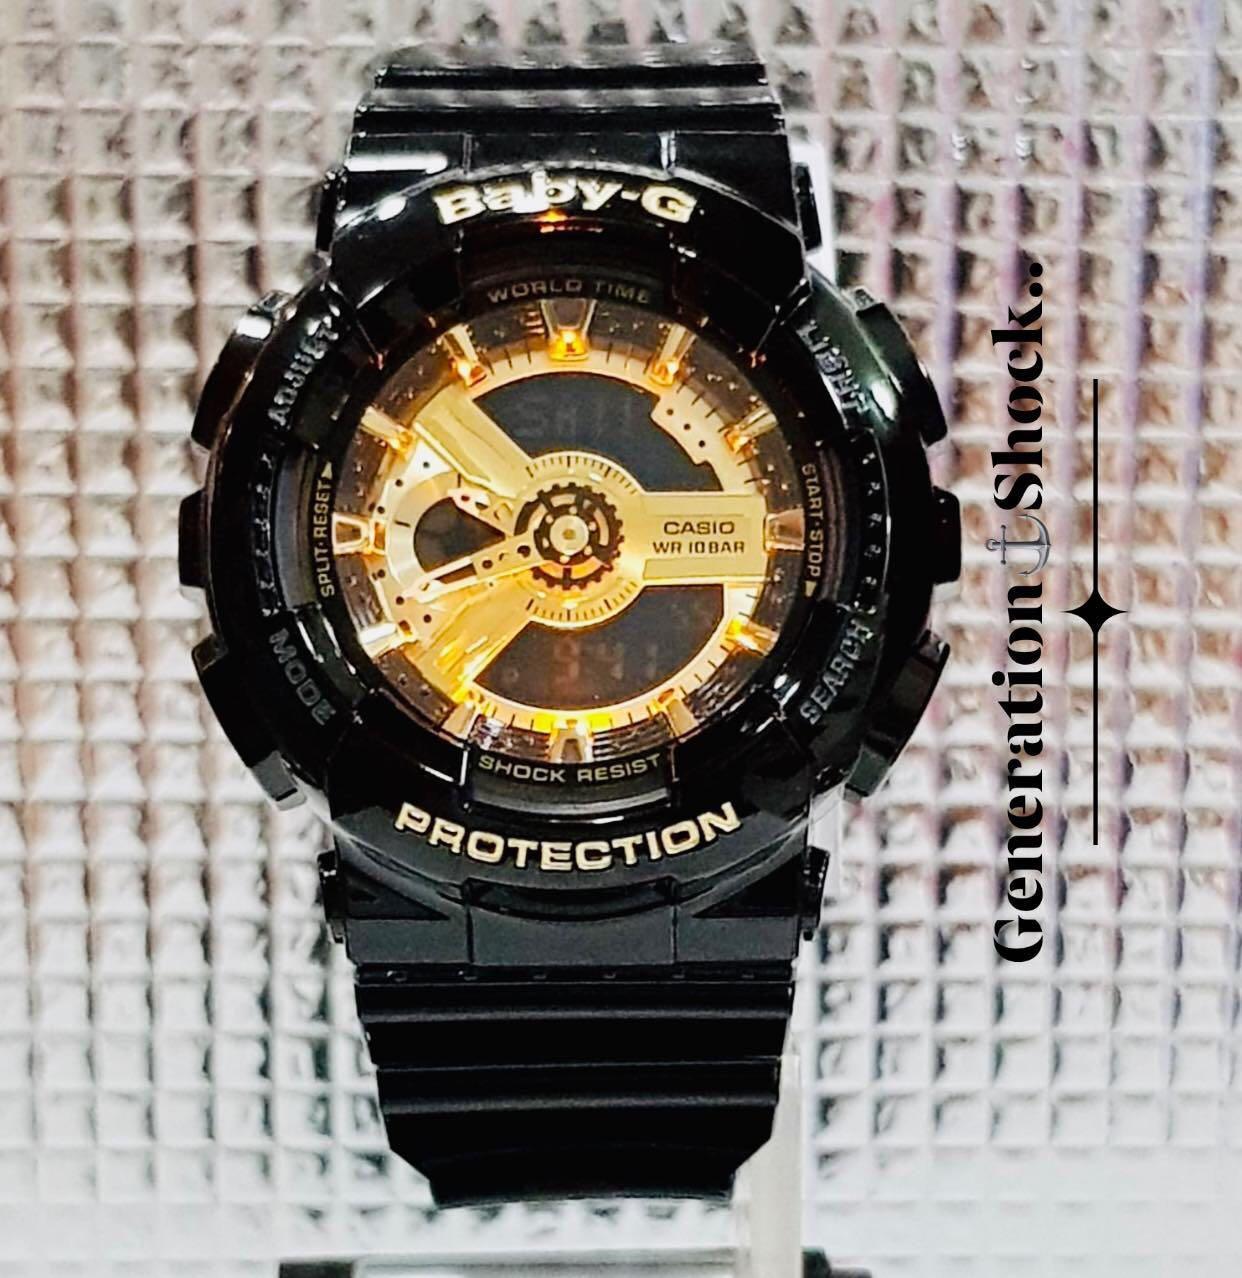 NEW🌟COUPLE💝SET : BABYG🌟GSHOCK UNISEX DIVER SPORTS WATCH  : 100% ORIGINAL AUTHENTIC CASIO BABY-G-SHOCK : GA-110GB-1A + BA-110-1A  / GA-110-1A (GLOSSY BLACK-GOLD)